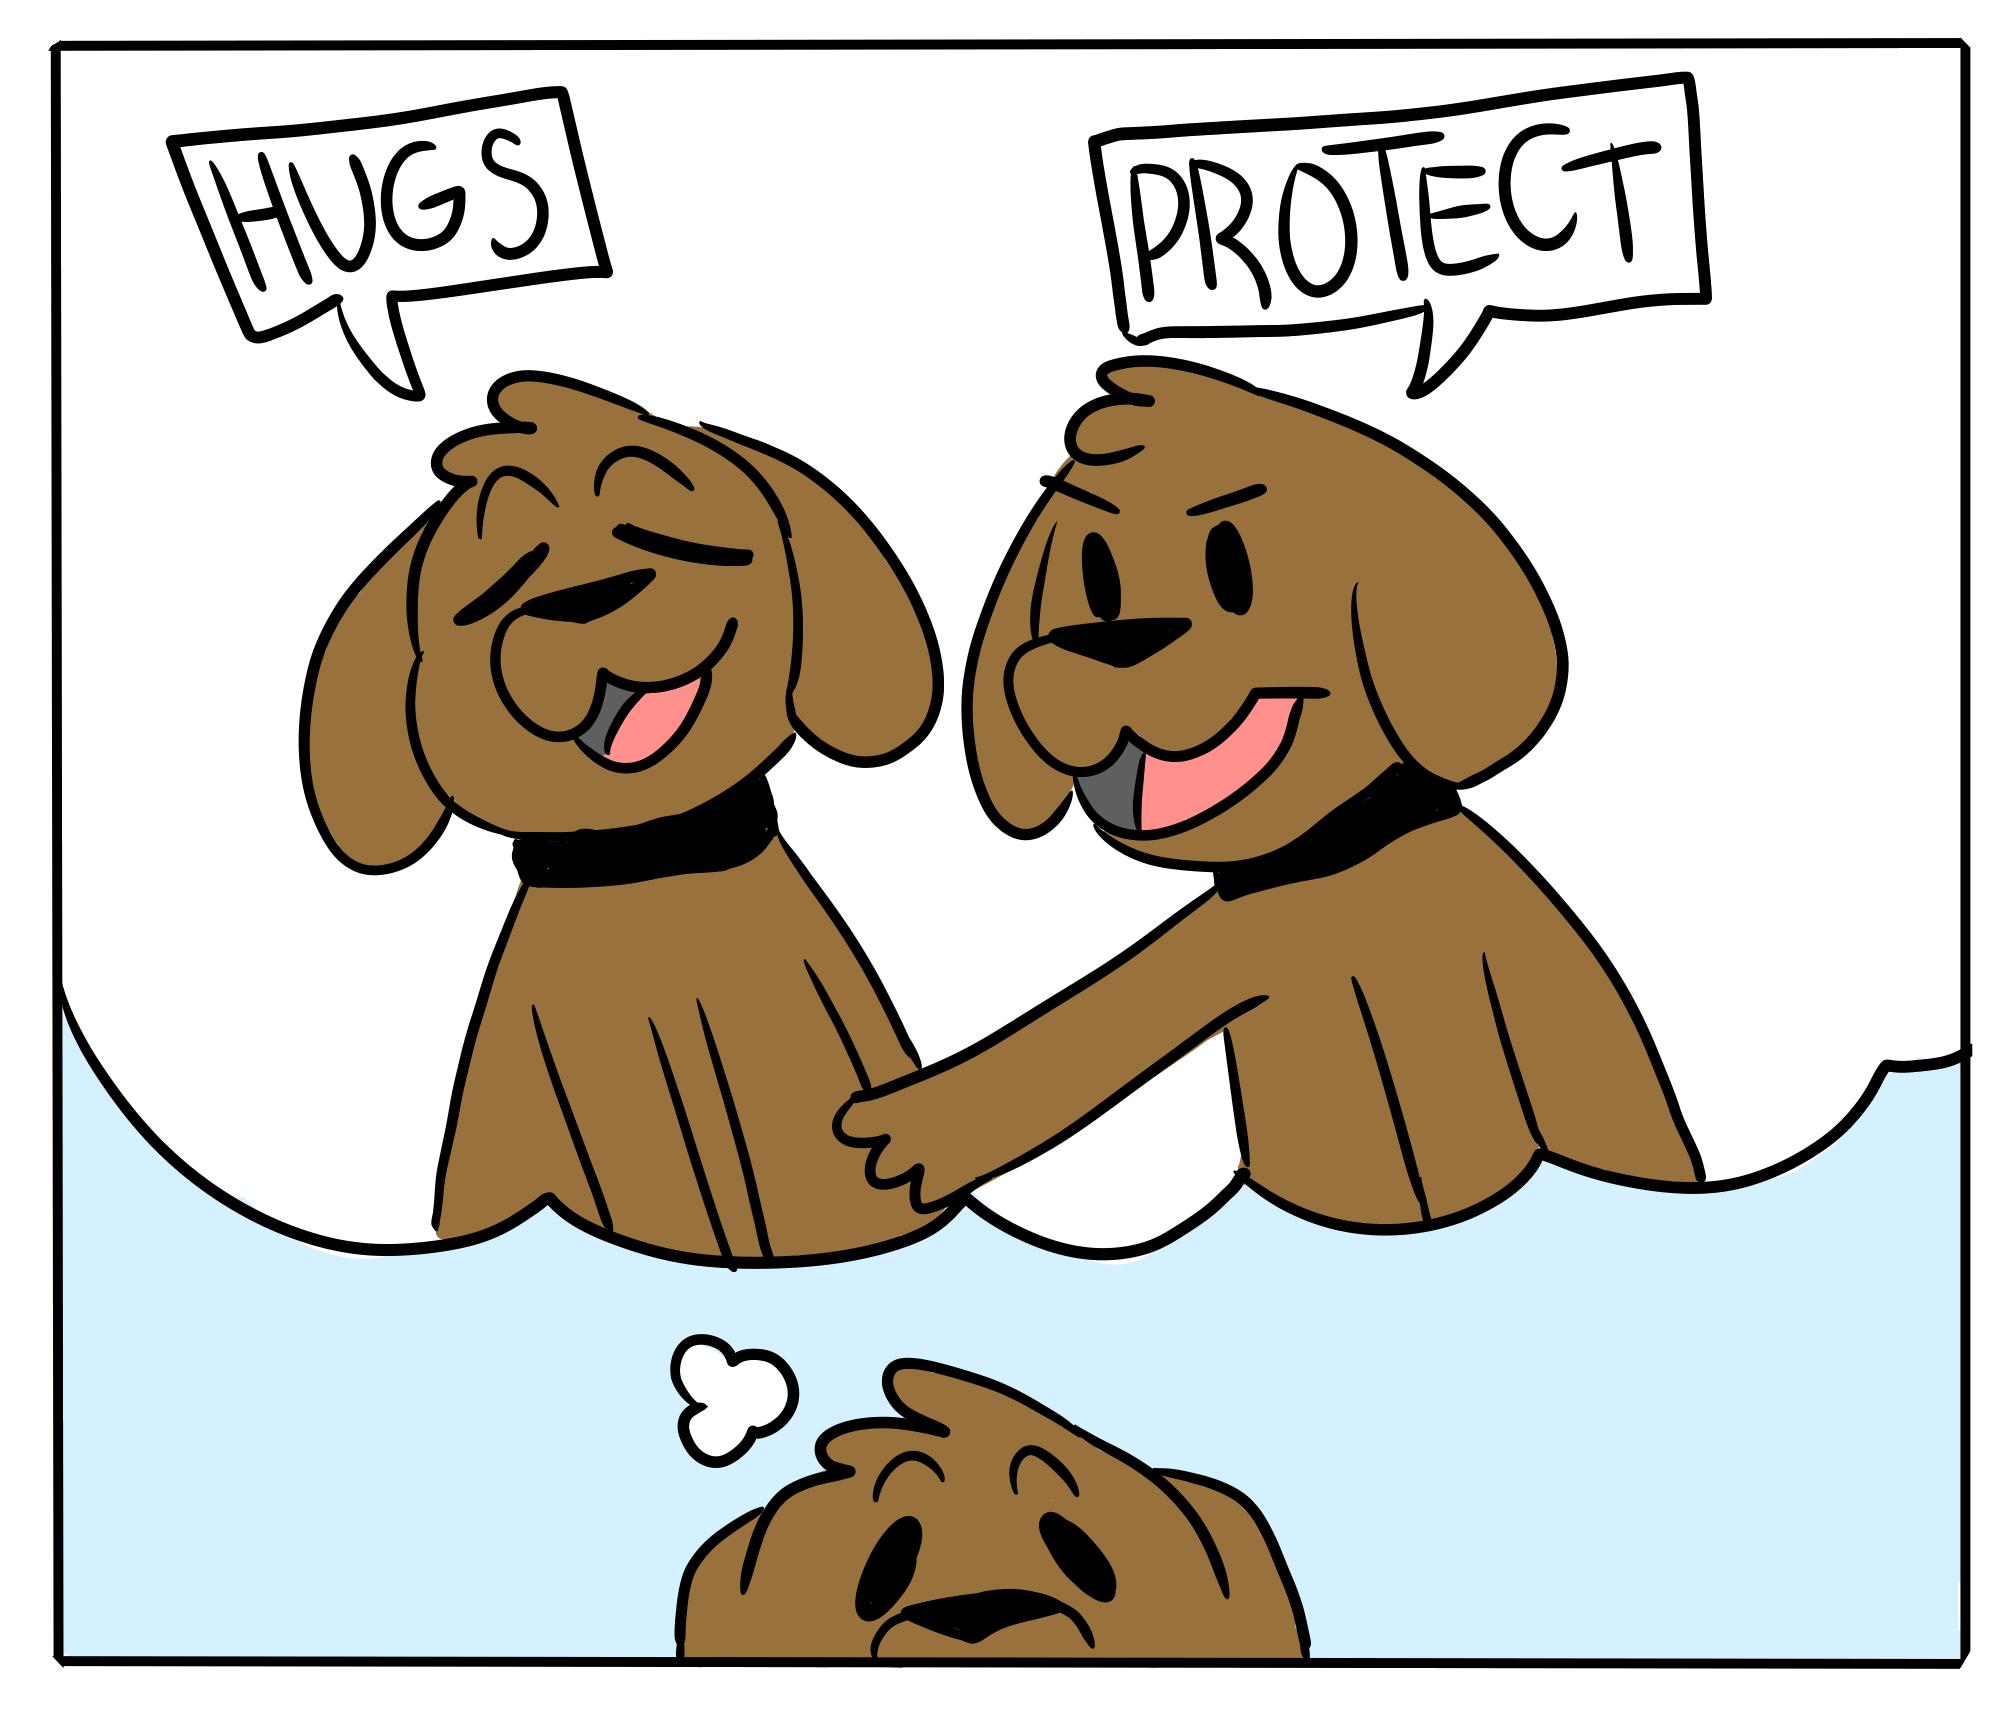 3 - Arya and Robbin Hugs vs Protect